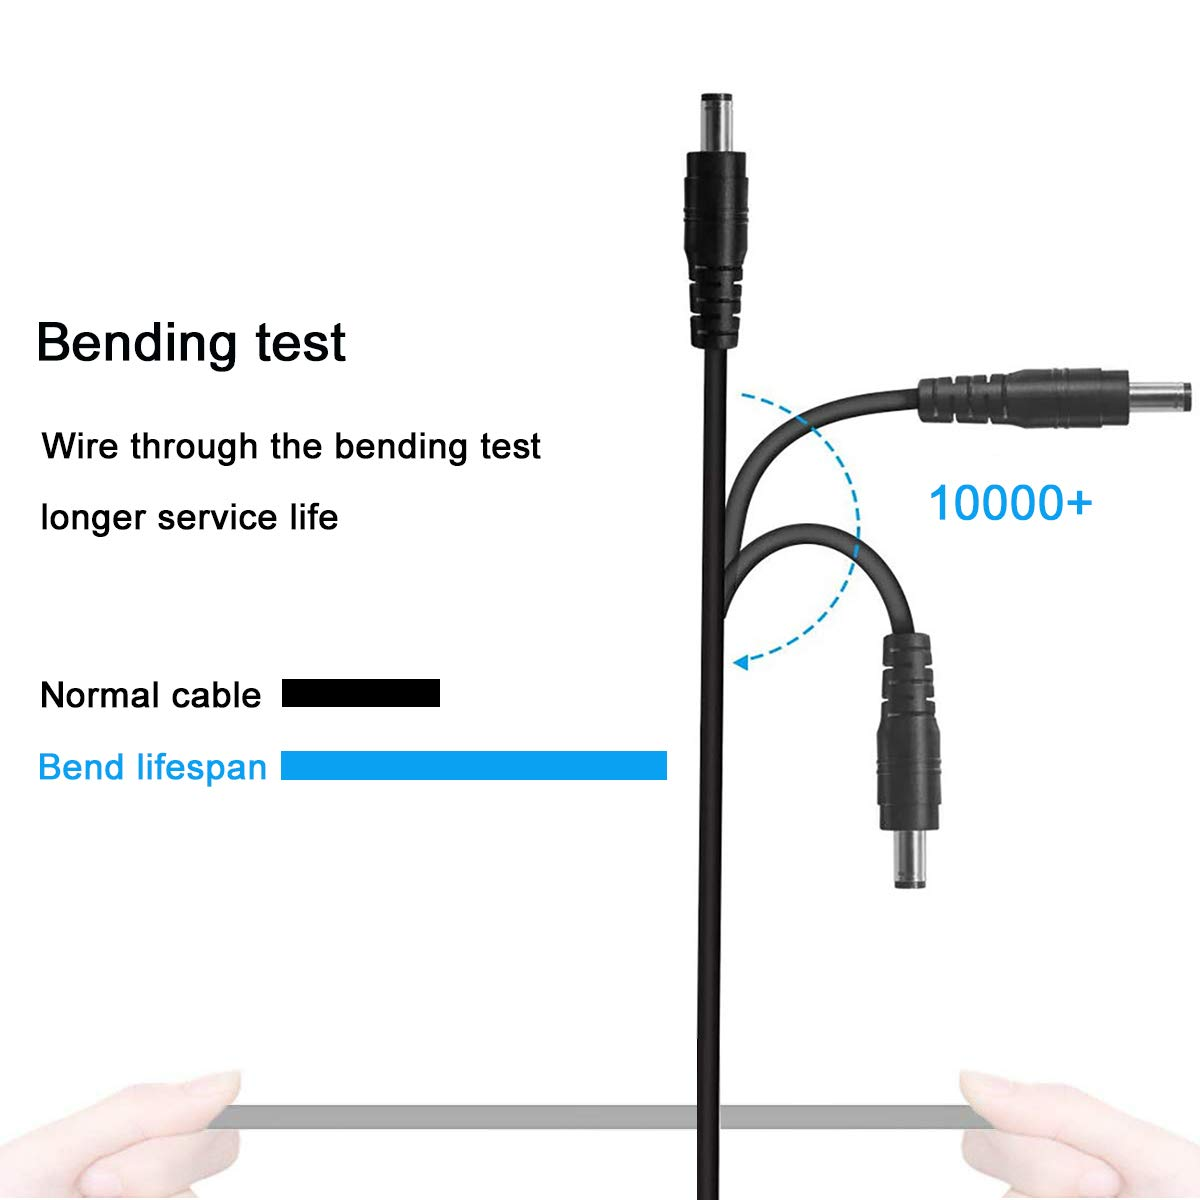 UXWEN USB to DC 5V Power Cord, Universal DC 5.5x2.1mm Plug Charging Cable with 10 Connector Tips(5.5x2.5, 4.8x1.7, 4.0x1.7, 4.0x1.35, 3.5x1.35, 3.0x1.1, 2.5x0.7, Micro USB, Type-C, Mini USB)